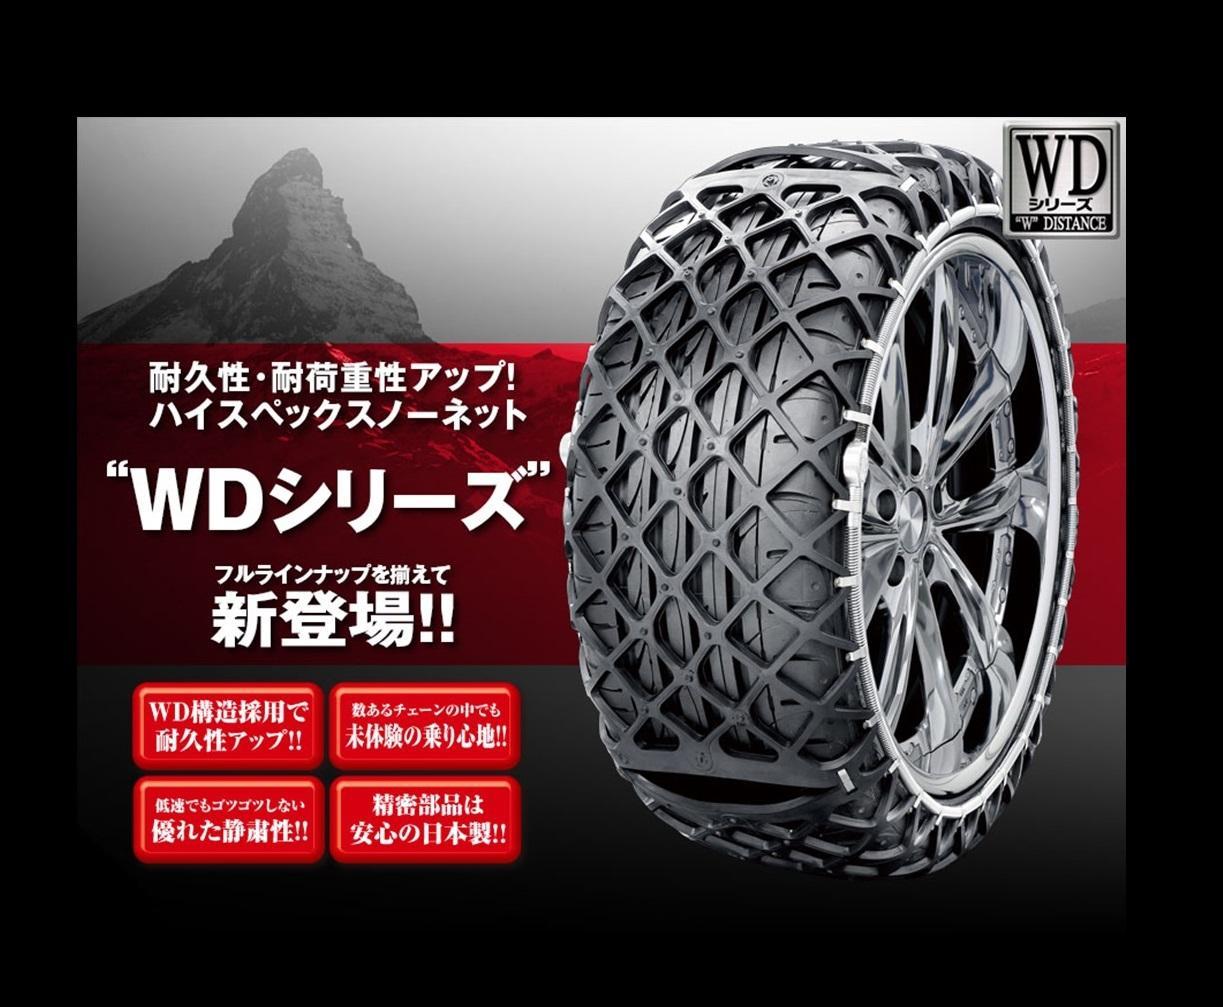 0287WD WDシリーズ 非金属タイヤチェーン JASSA認定品 Yeti Snow net